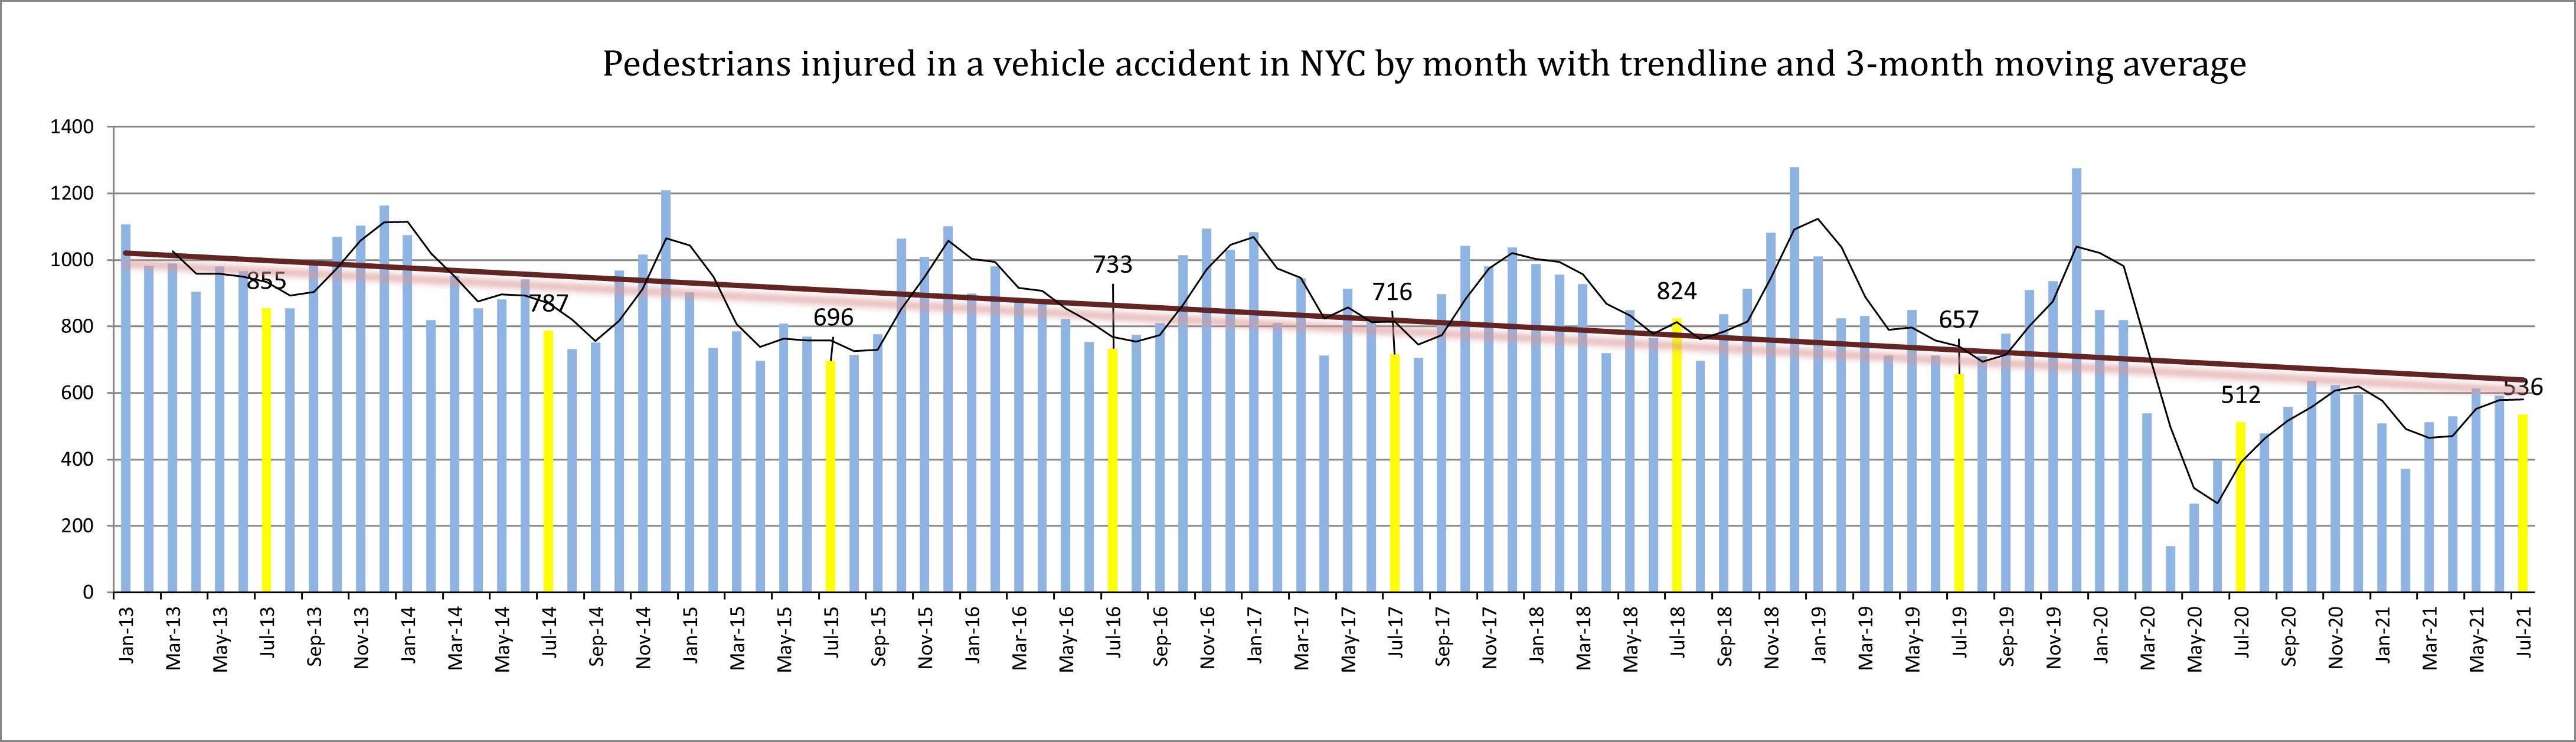 pedestrian injuries NYC July 21